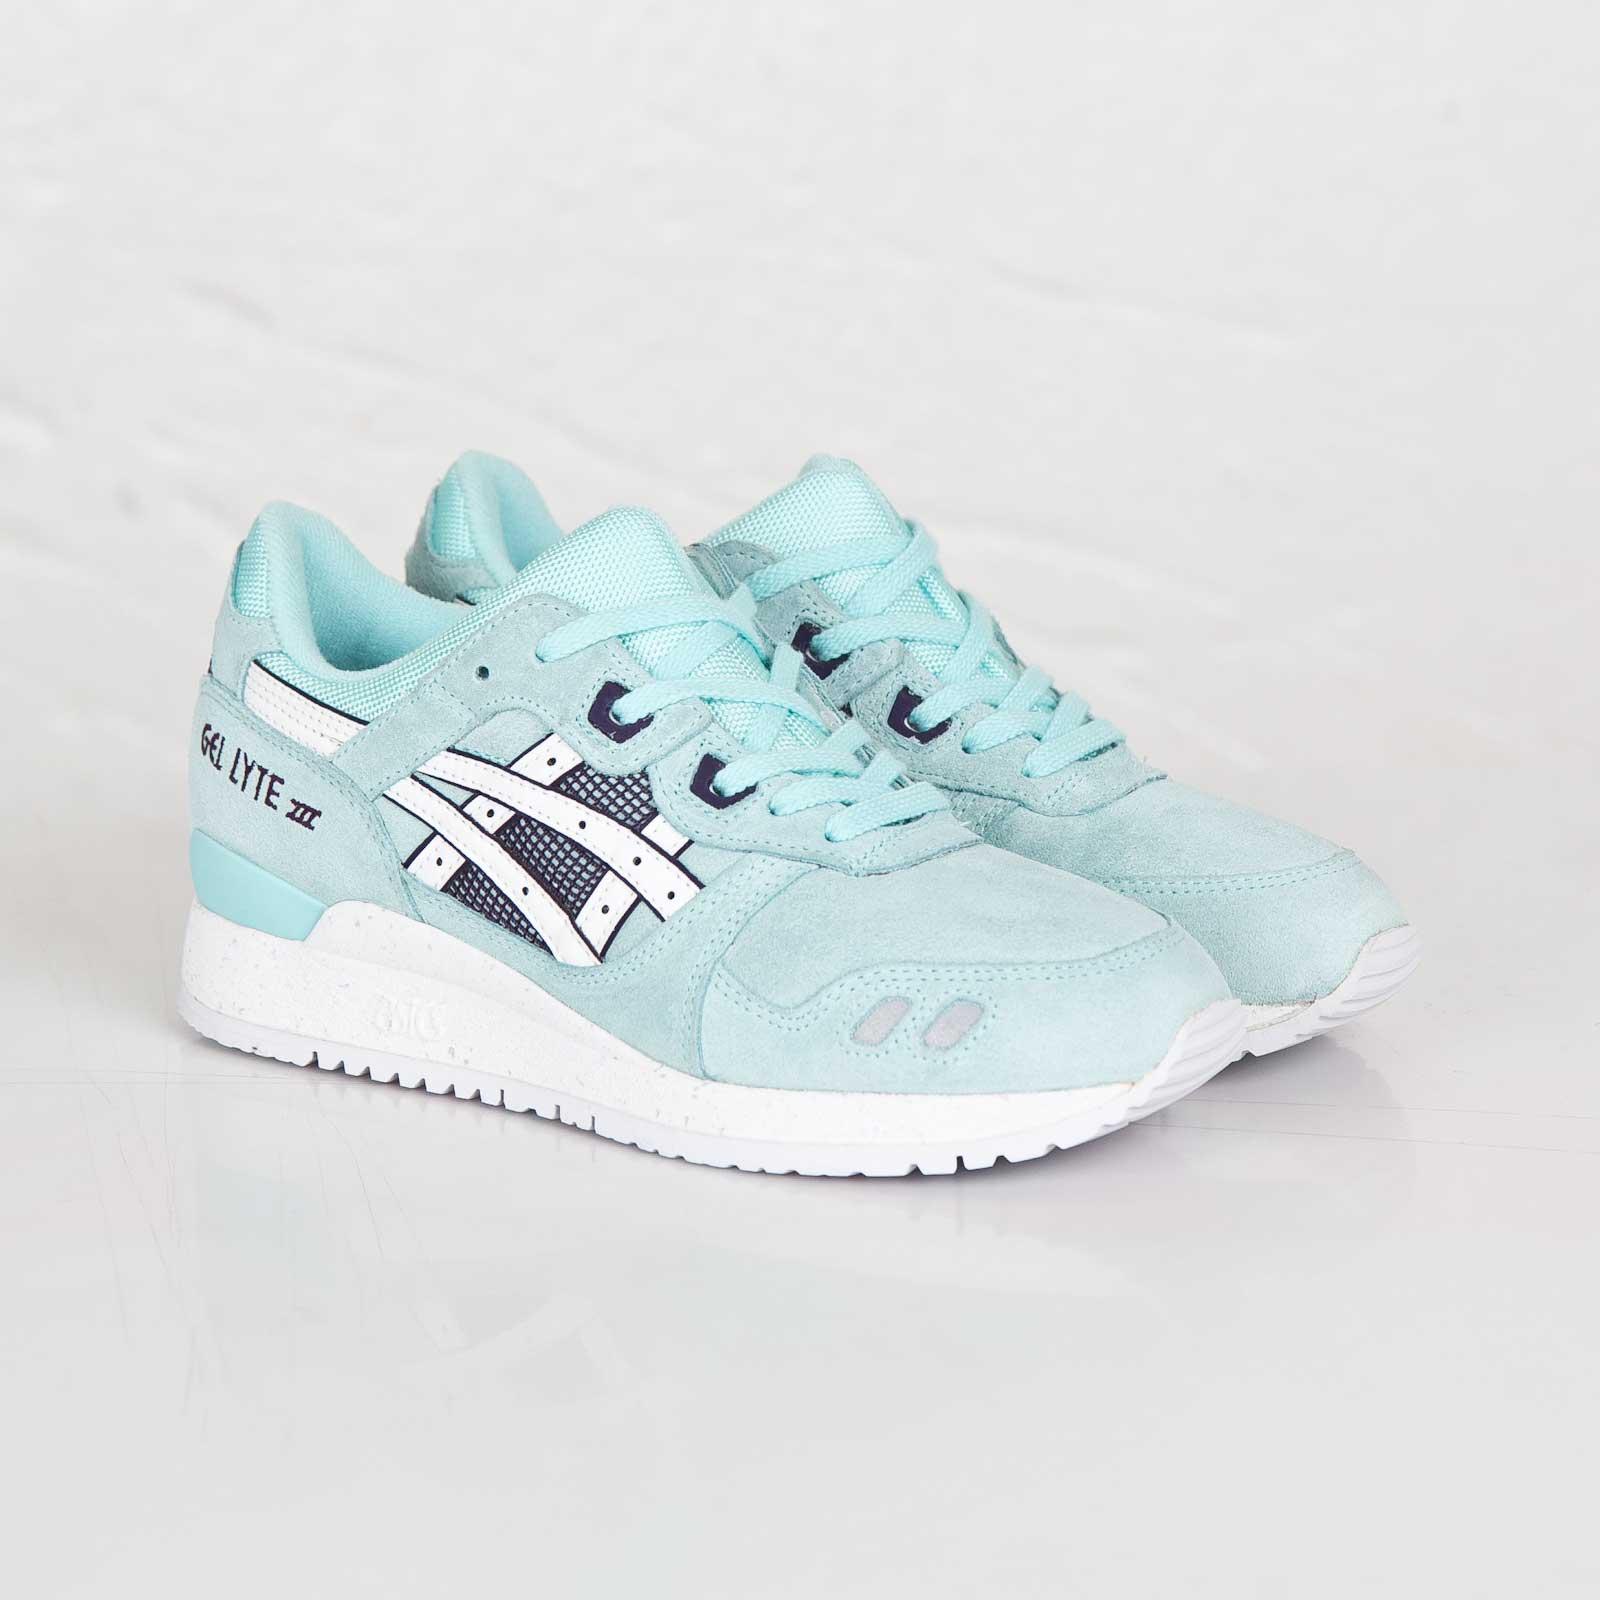 acheter en ligne e29c1 eee46 ASICS Tiger Gel-Lyte III - H478l-4101 - Sneakersnstuff ...